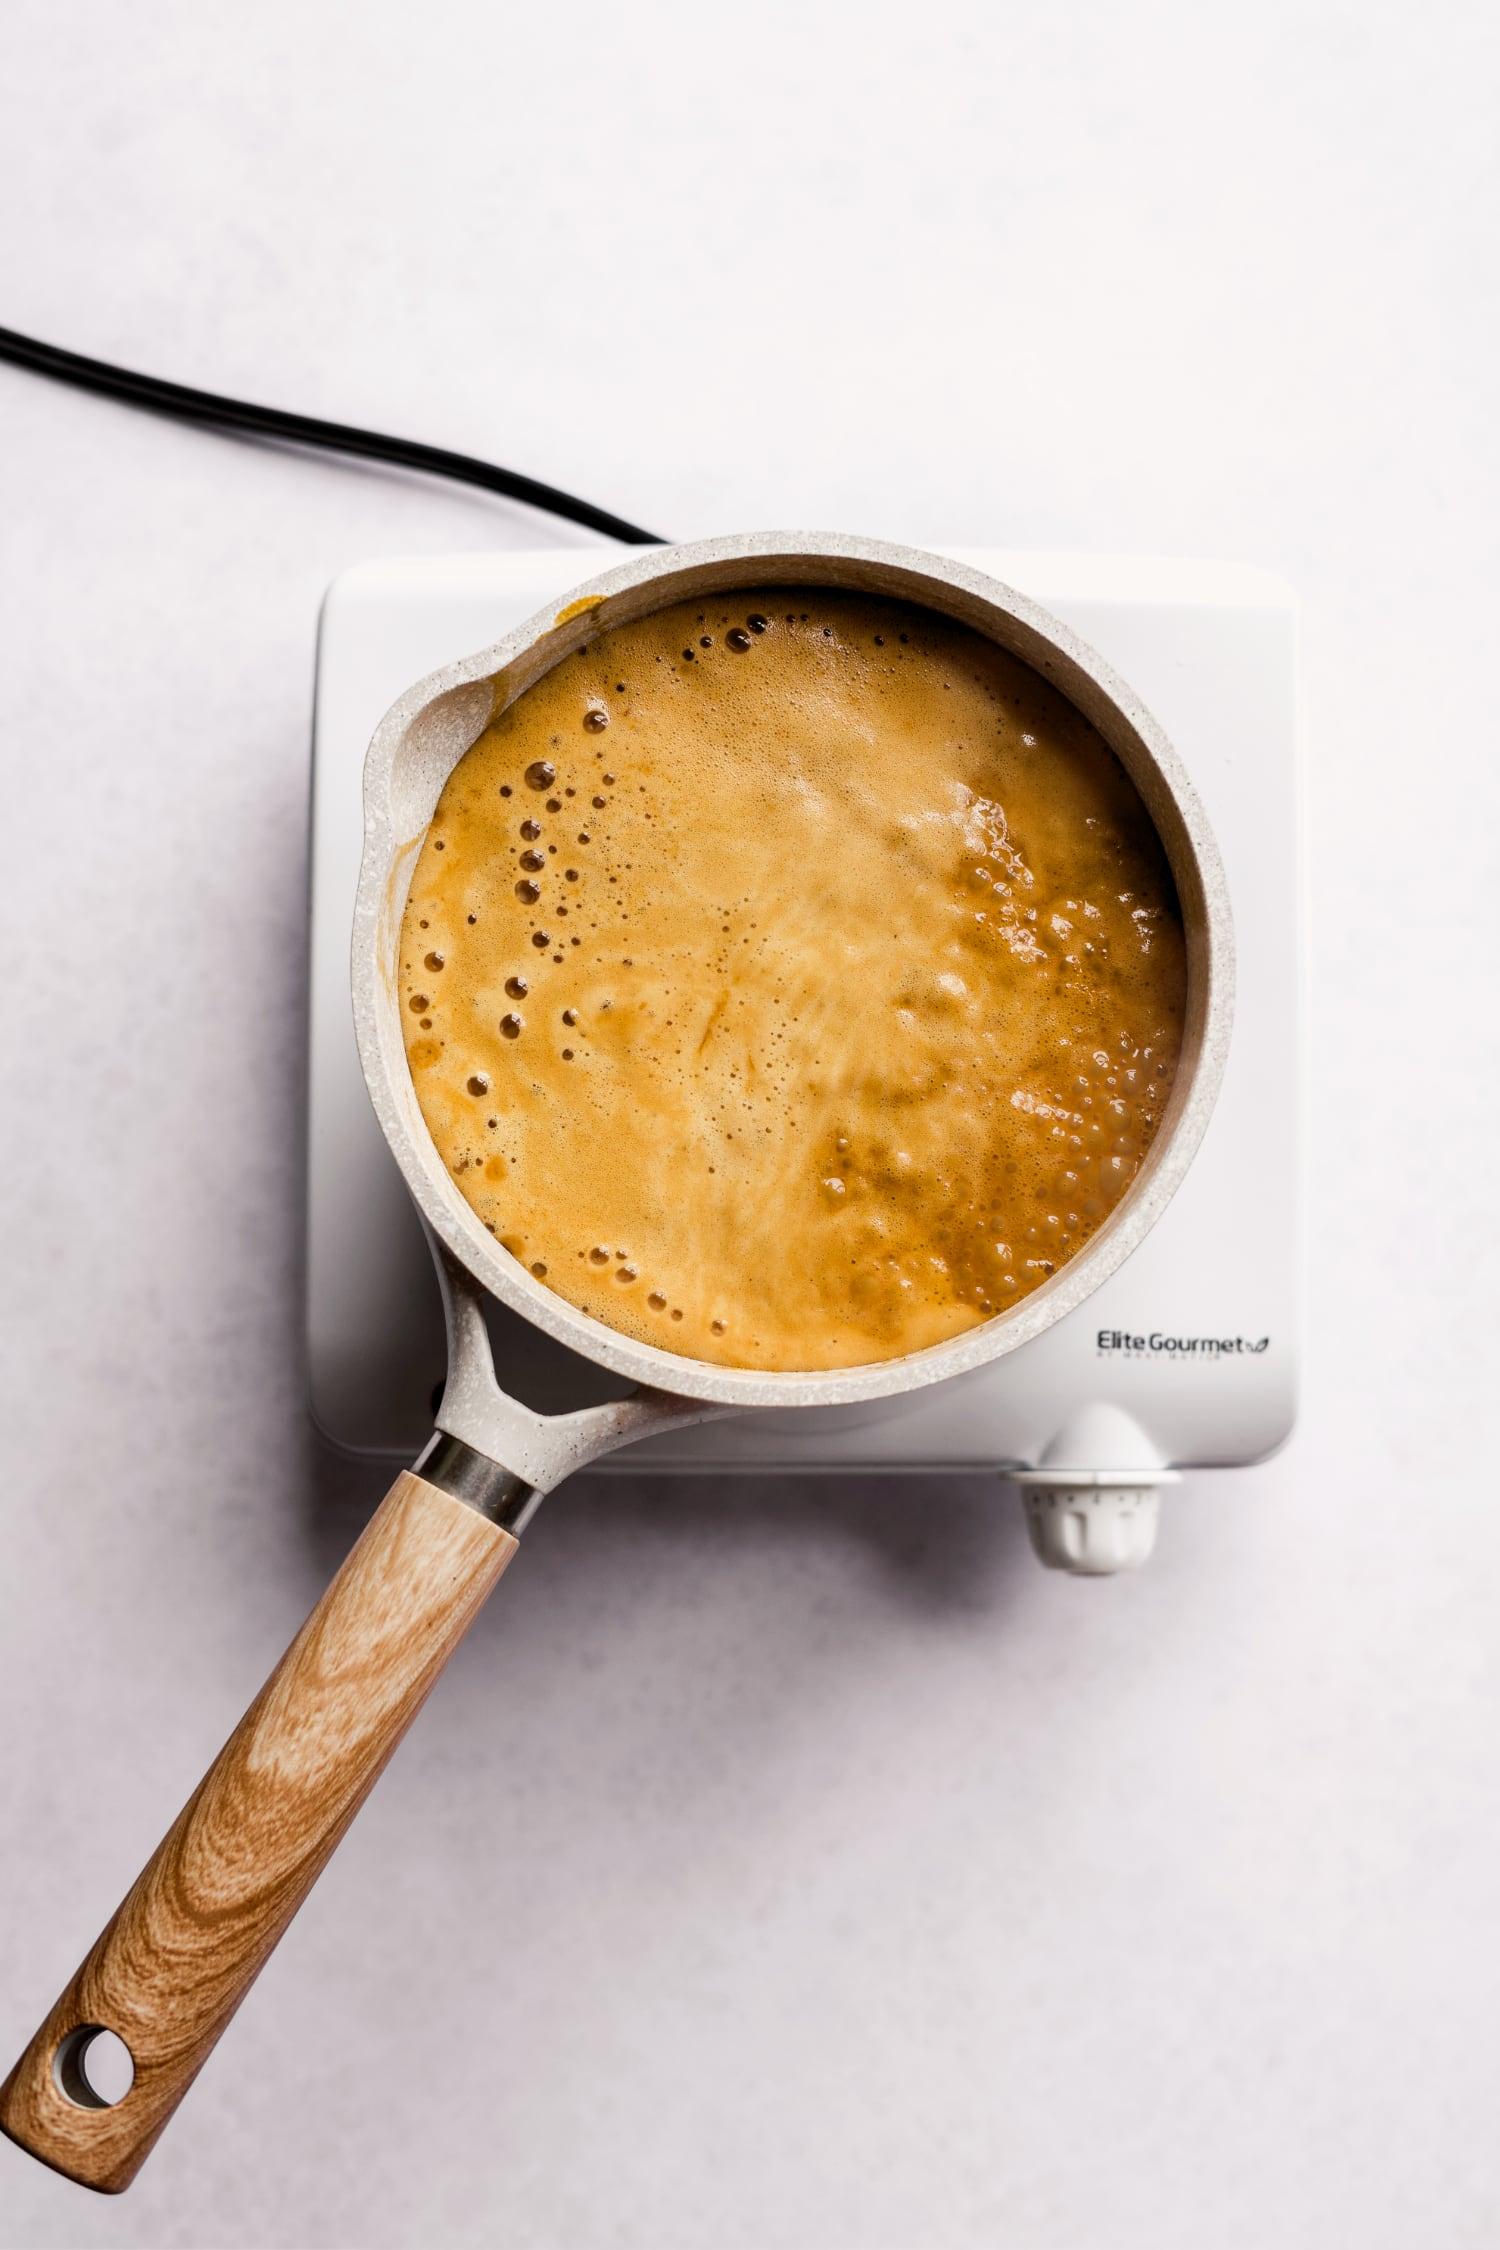 vegan caramel sauce boiling in the pan